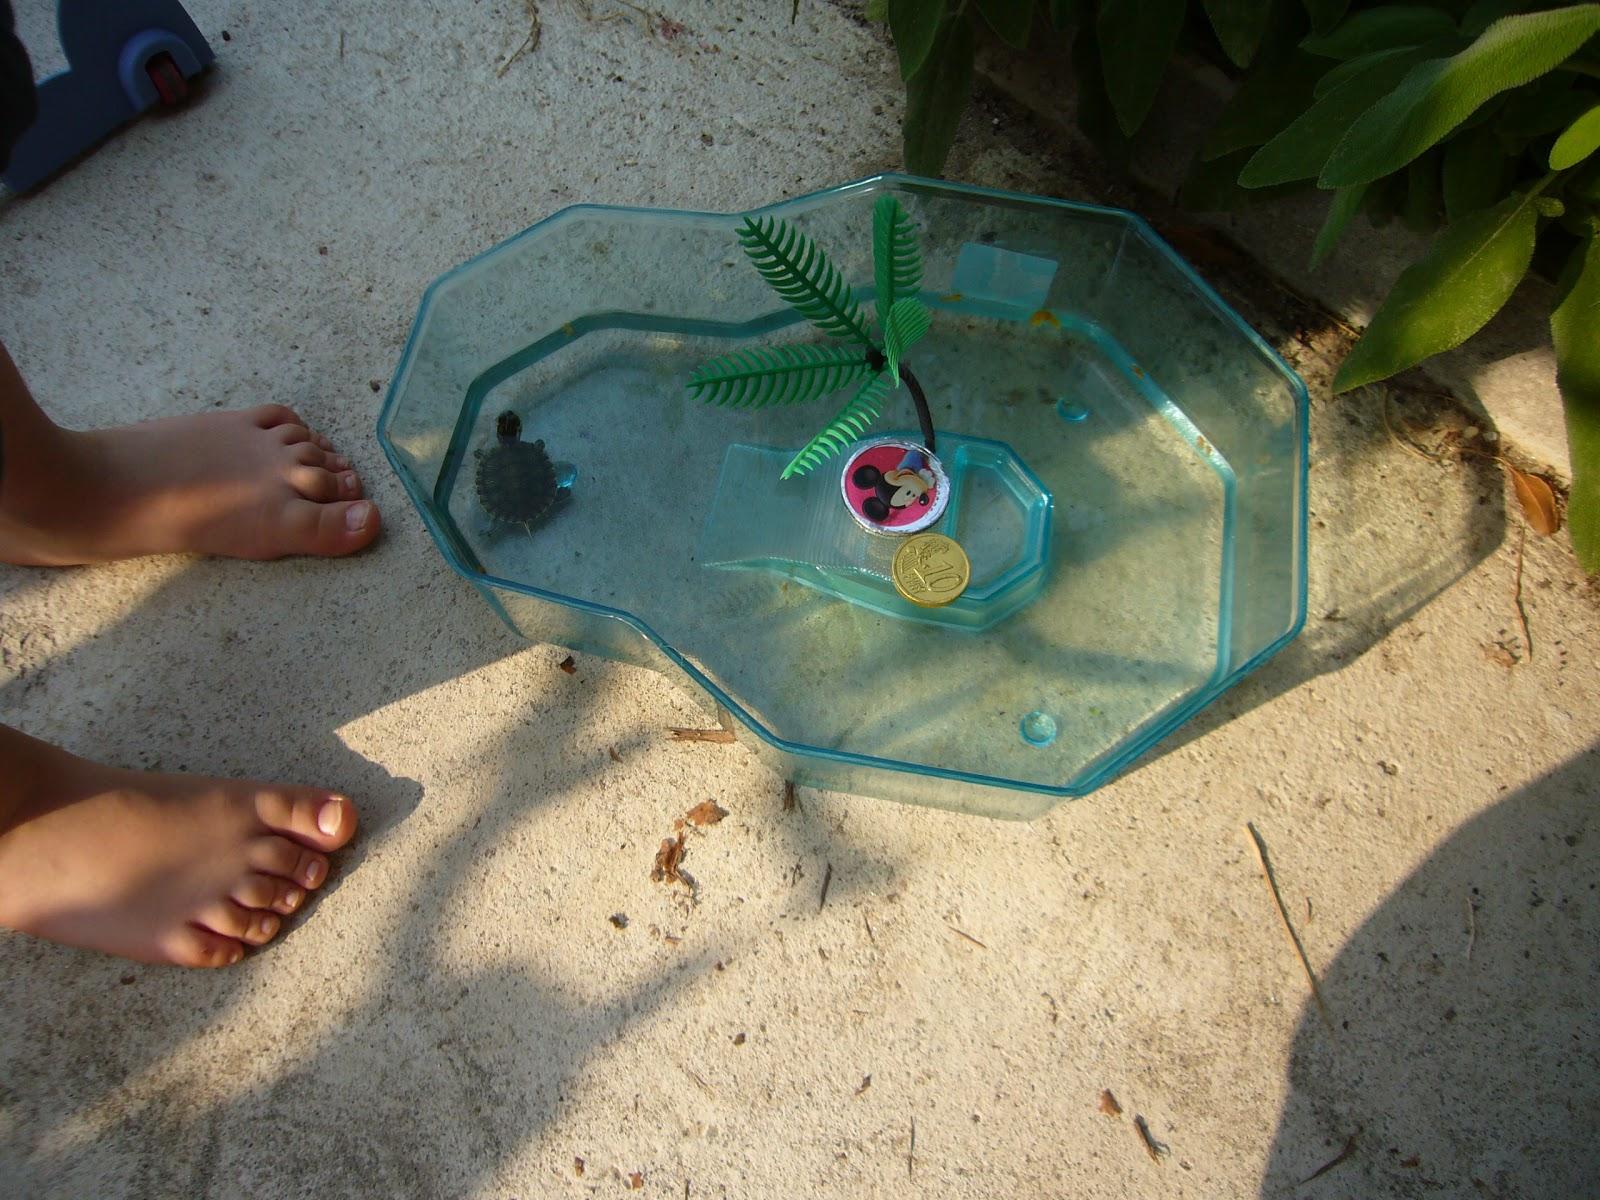 Salviamo suzy tartarughine d 39 acqua for Vaschetta tartarughe prezzo